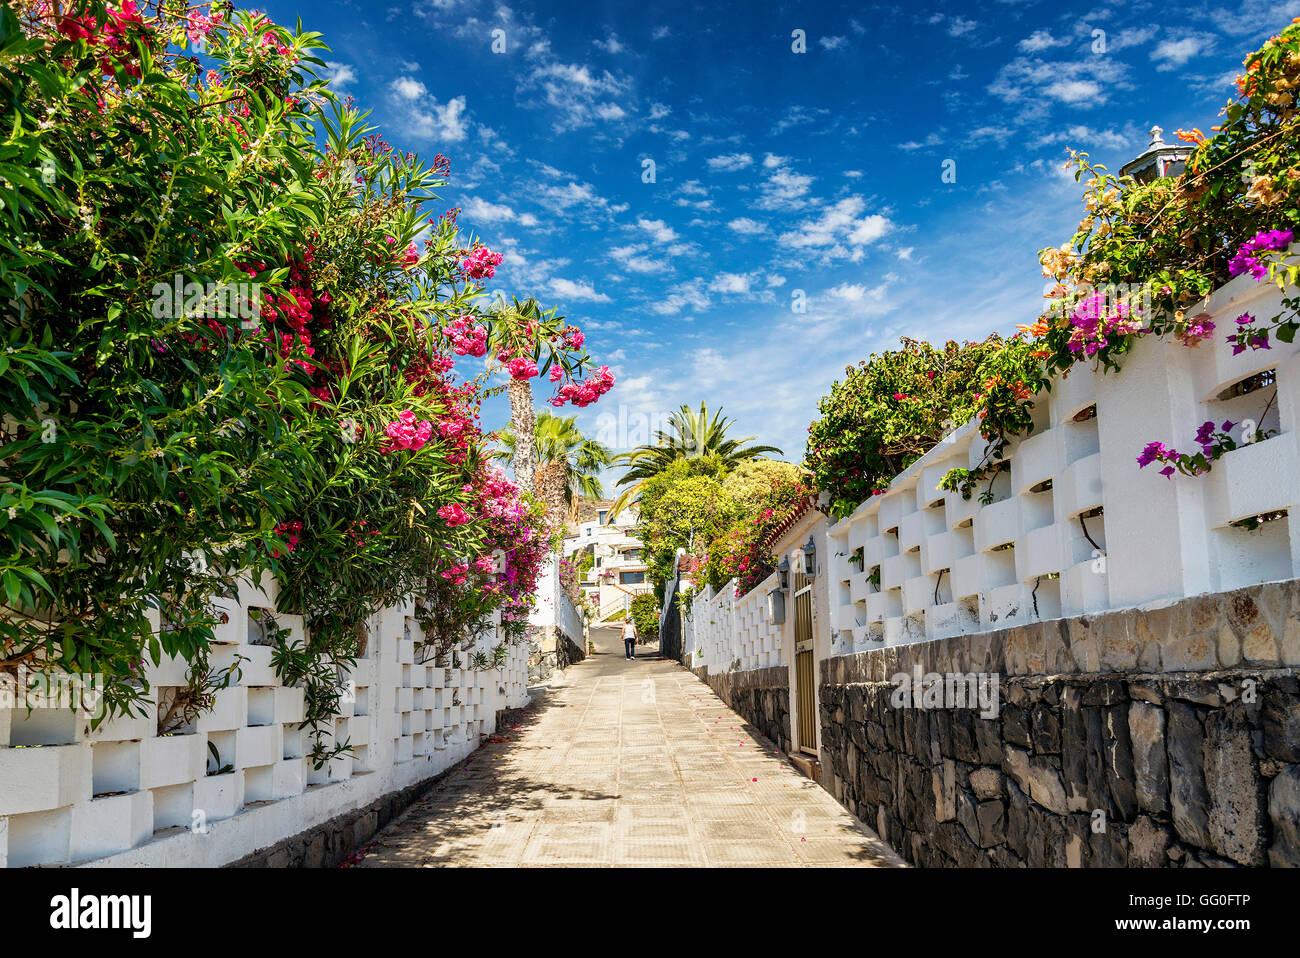 flowered alley street in los gigantes residential area tenerife spain - Stock Image